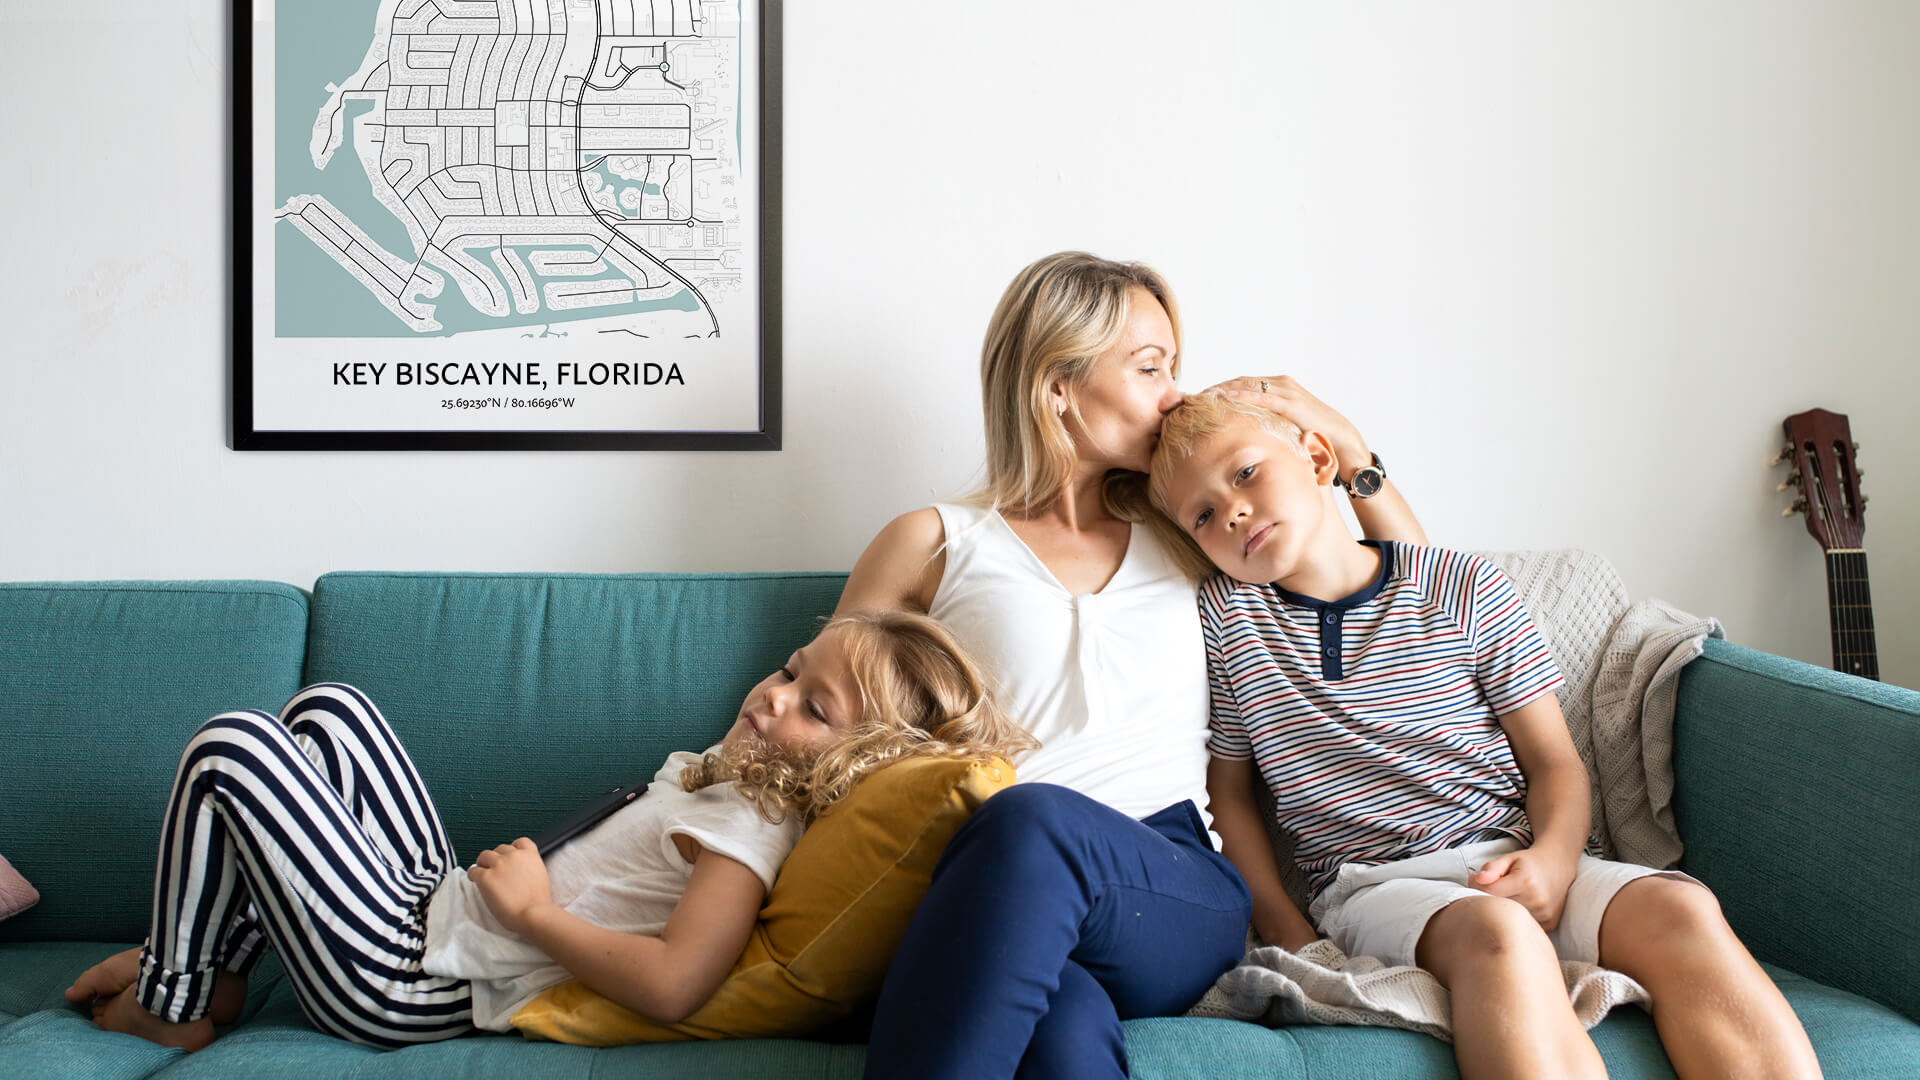 Key Biscayne map poster